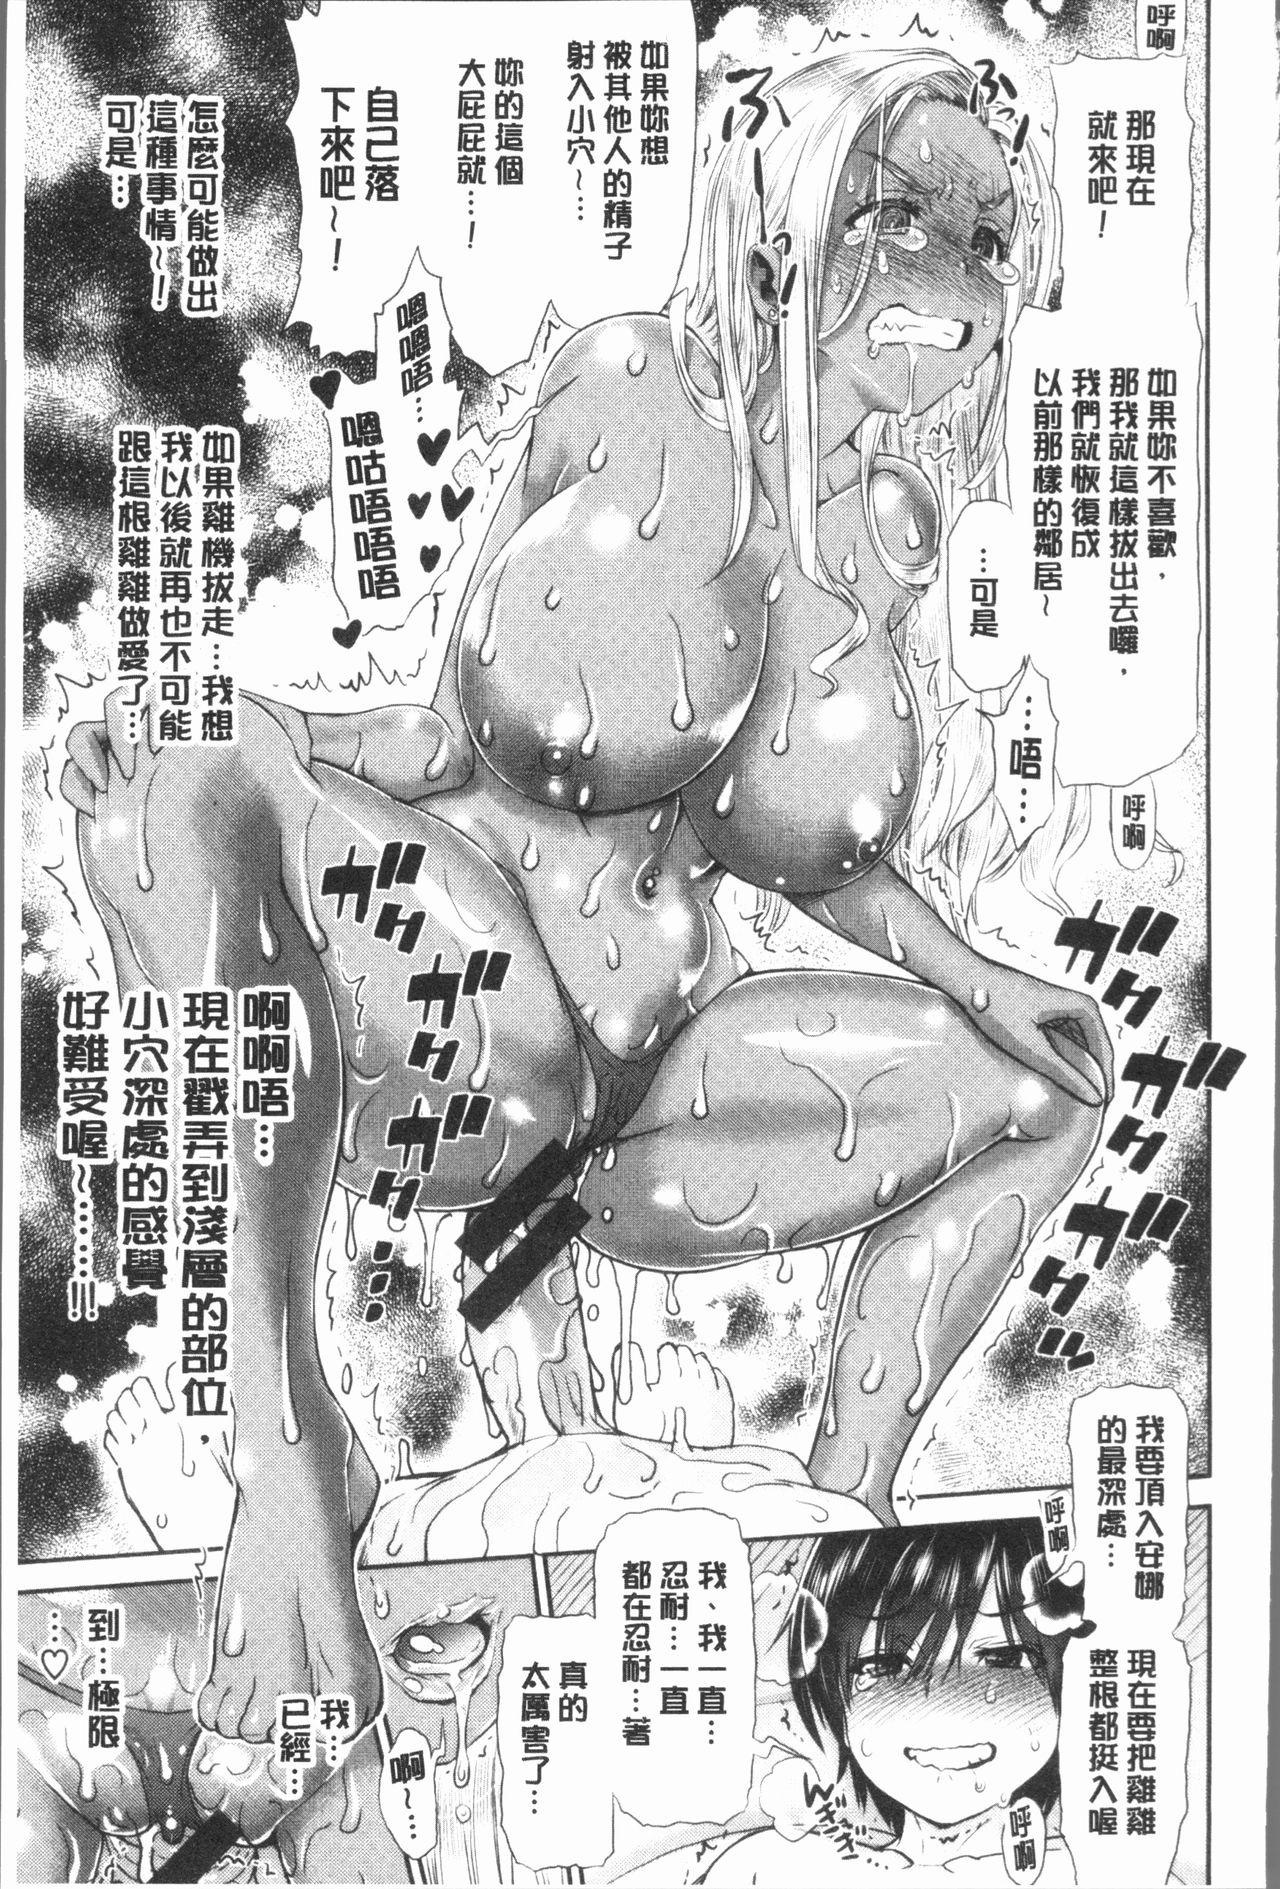 Mein Hole - Girls' Hole | 女淫小肉穴 154